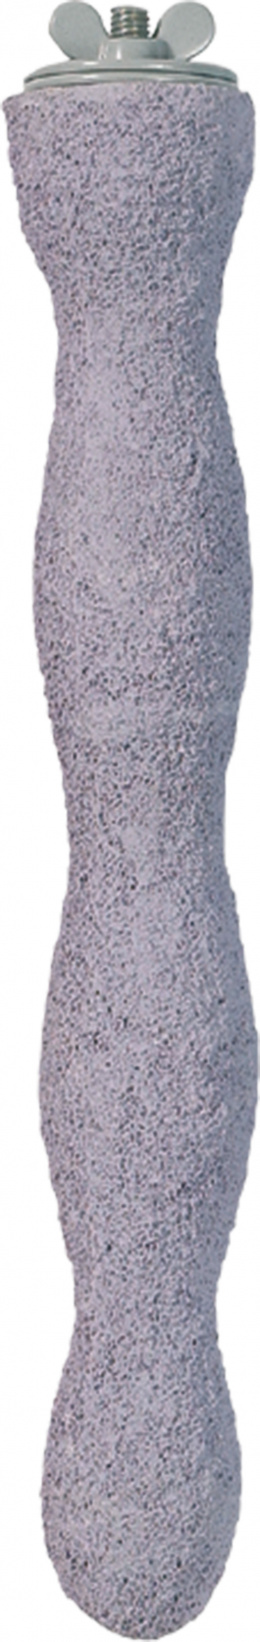 Bidýlko cement 34cmx6cm